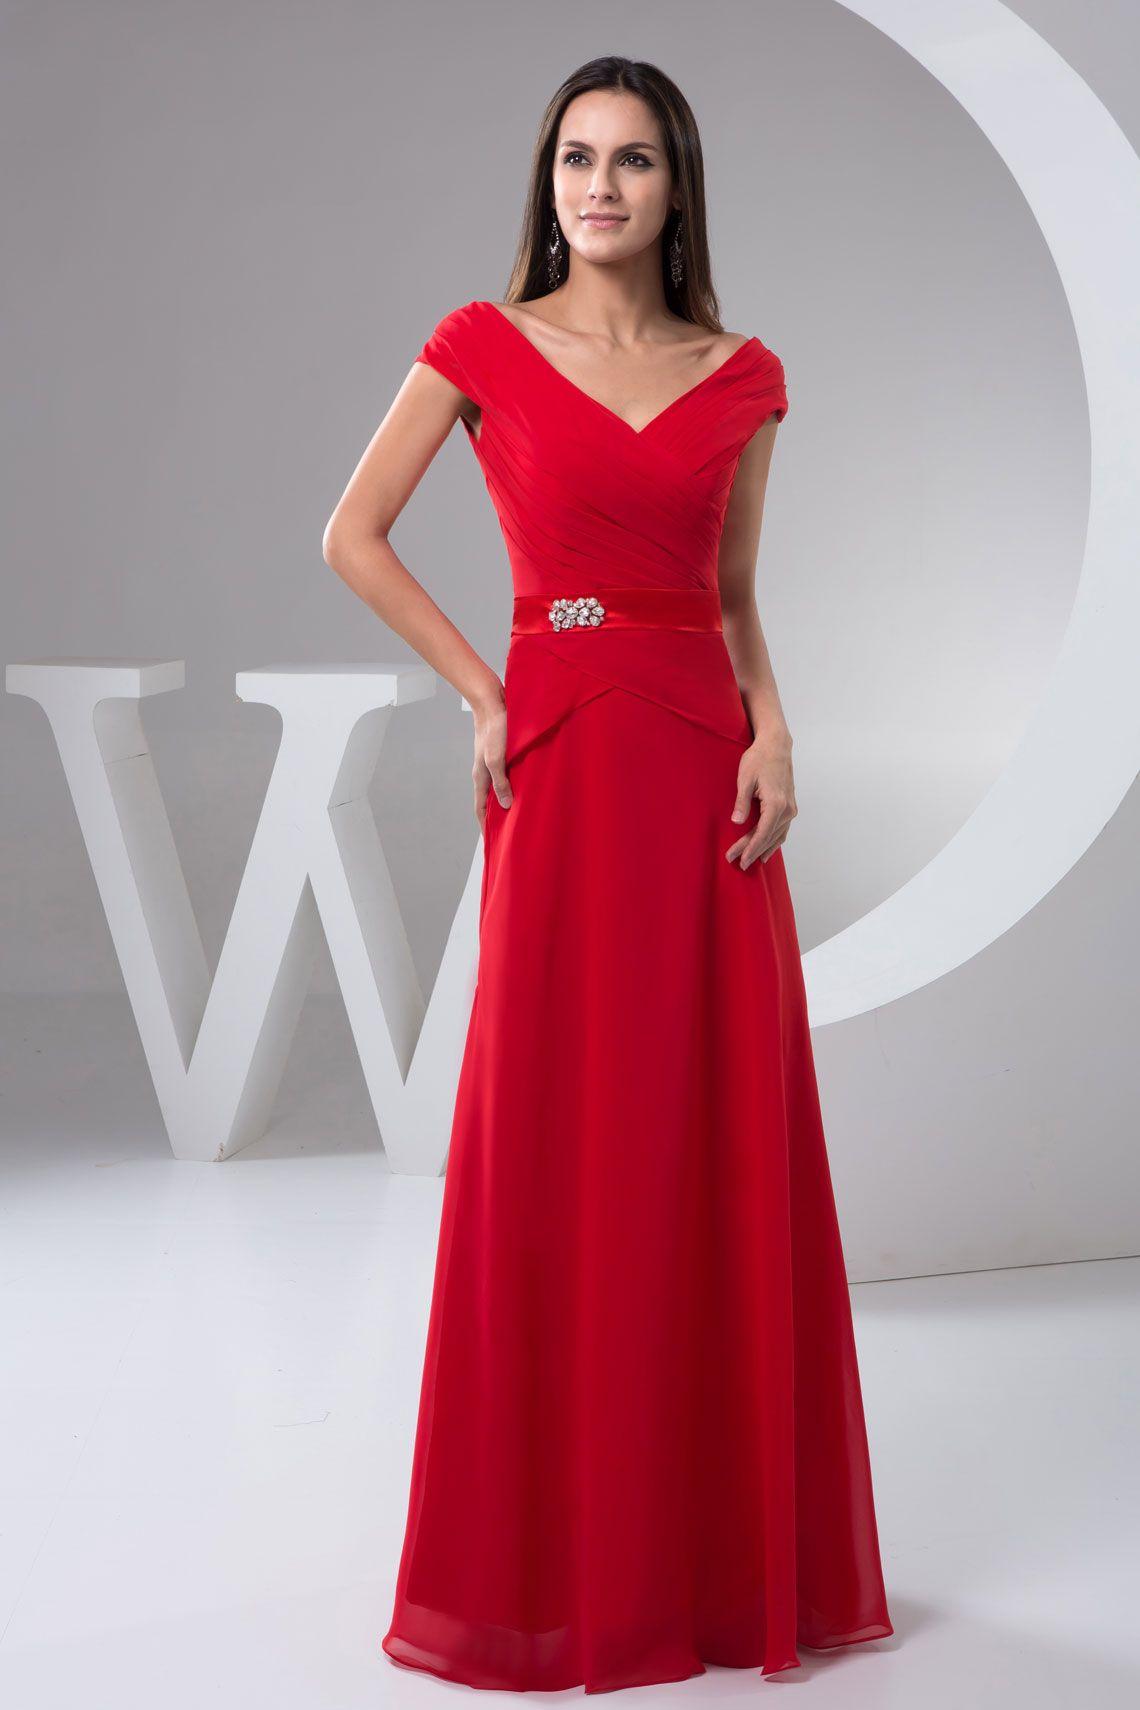 8103a3eb45f1 cap sleeve long red crystal zipper v-neck pleated evening dress -  Whoboxdress.com. Ravishing Red Floor-Length V-Neck A-Line Chiffon Sleeveless  ...